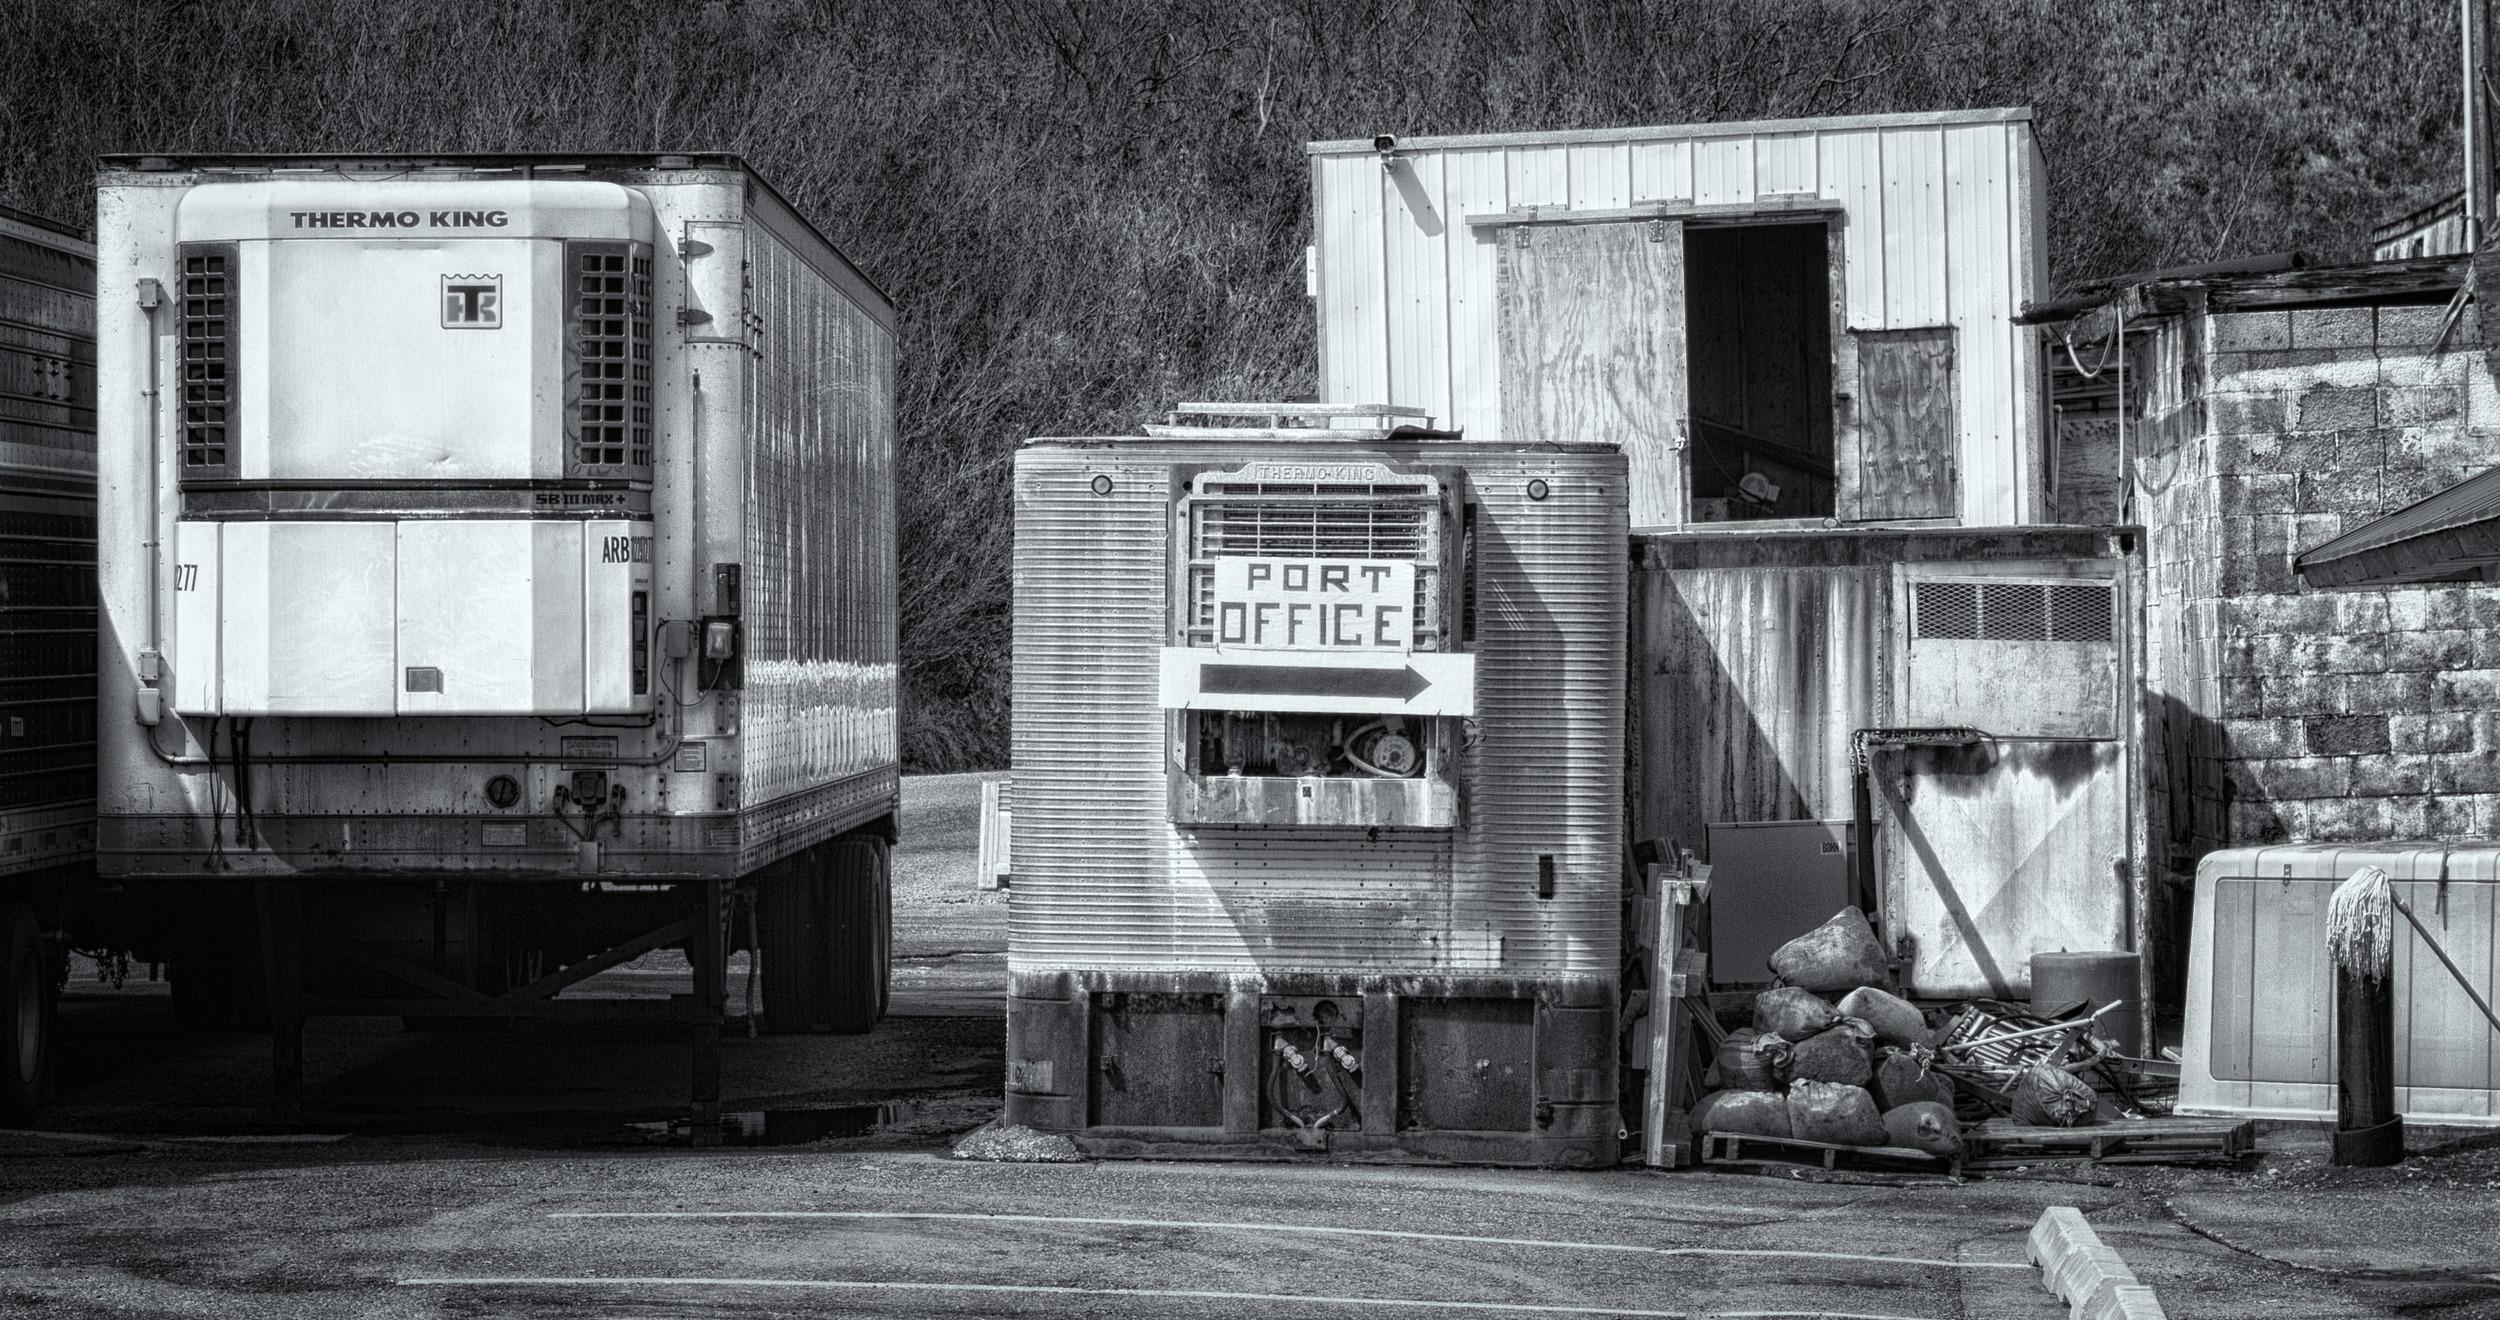 Port Orford Office.jpg